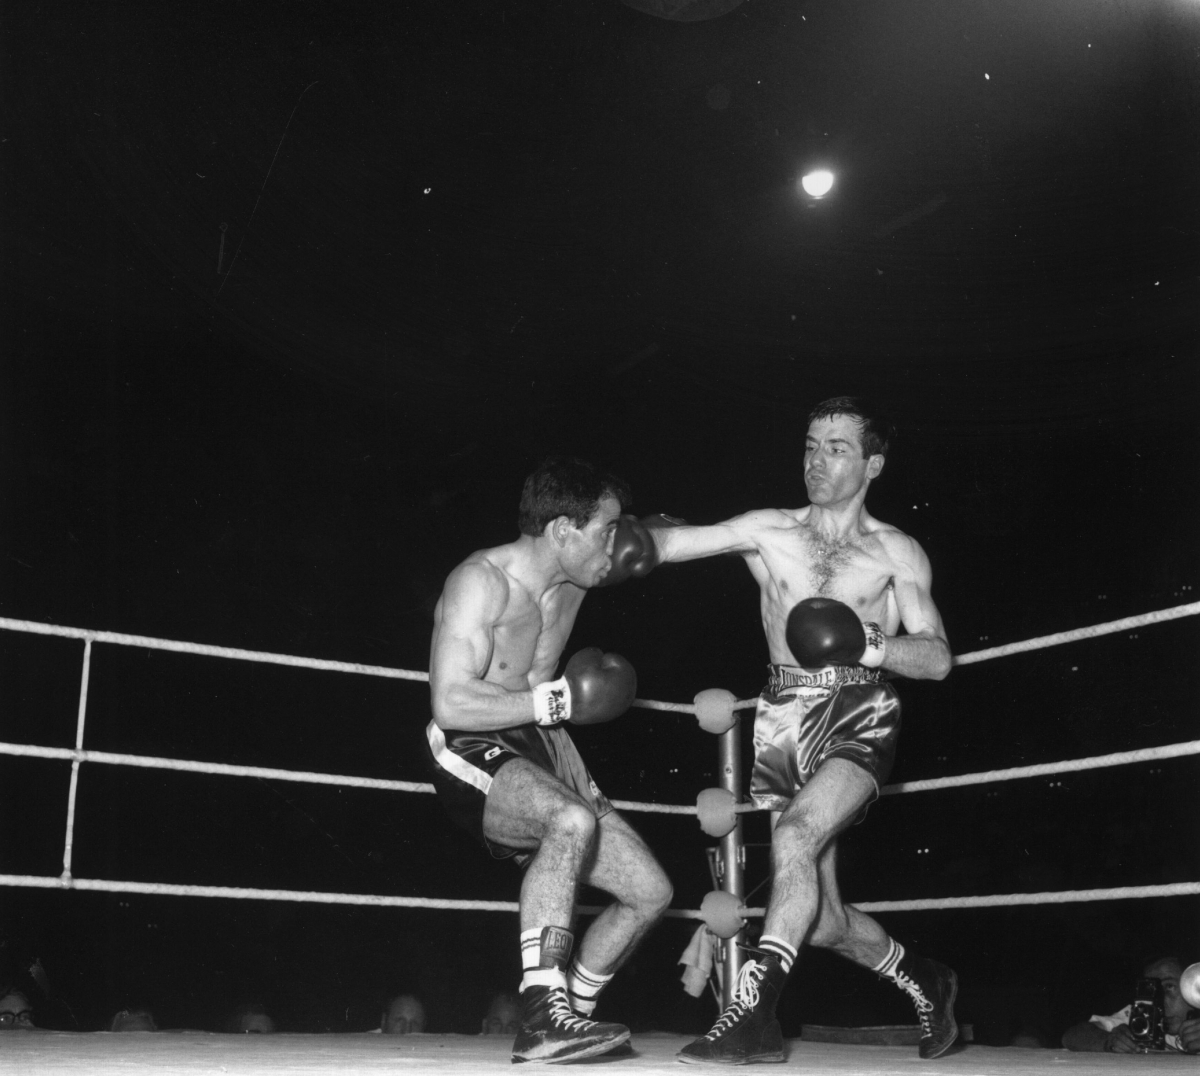 Walter McGowan, Salvatore Burruni